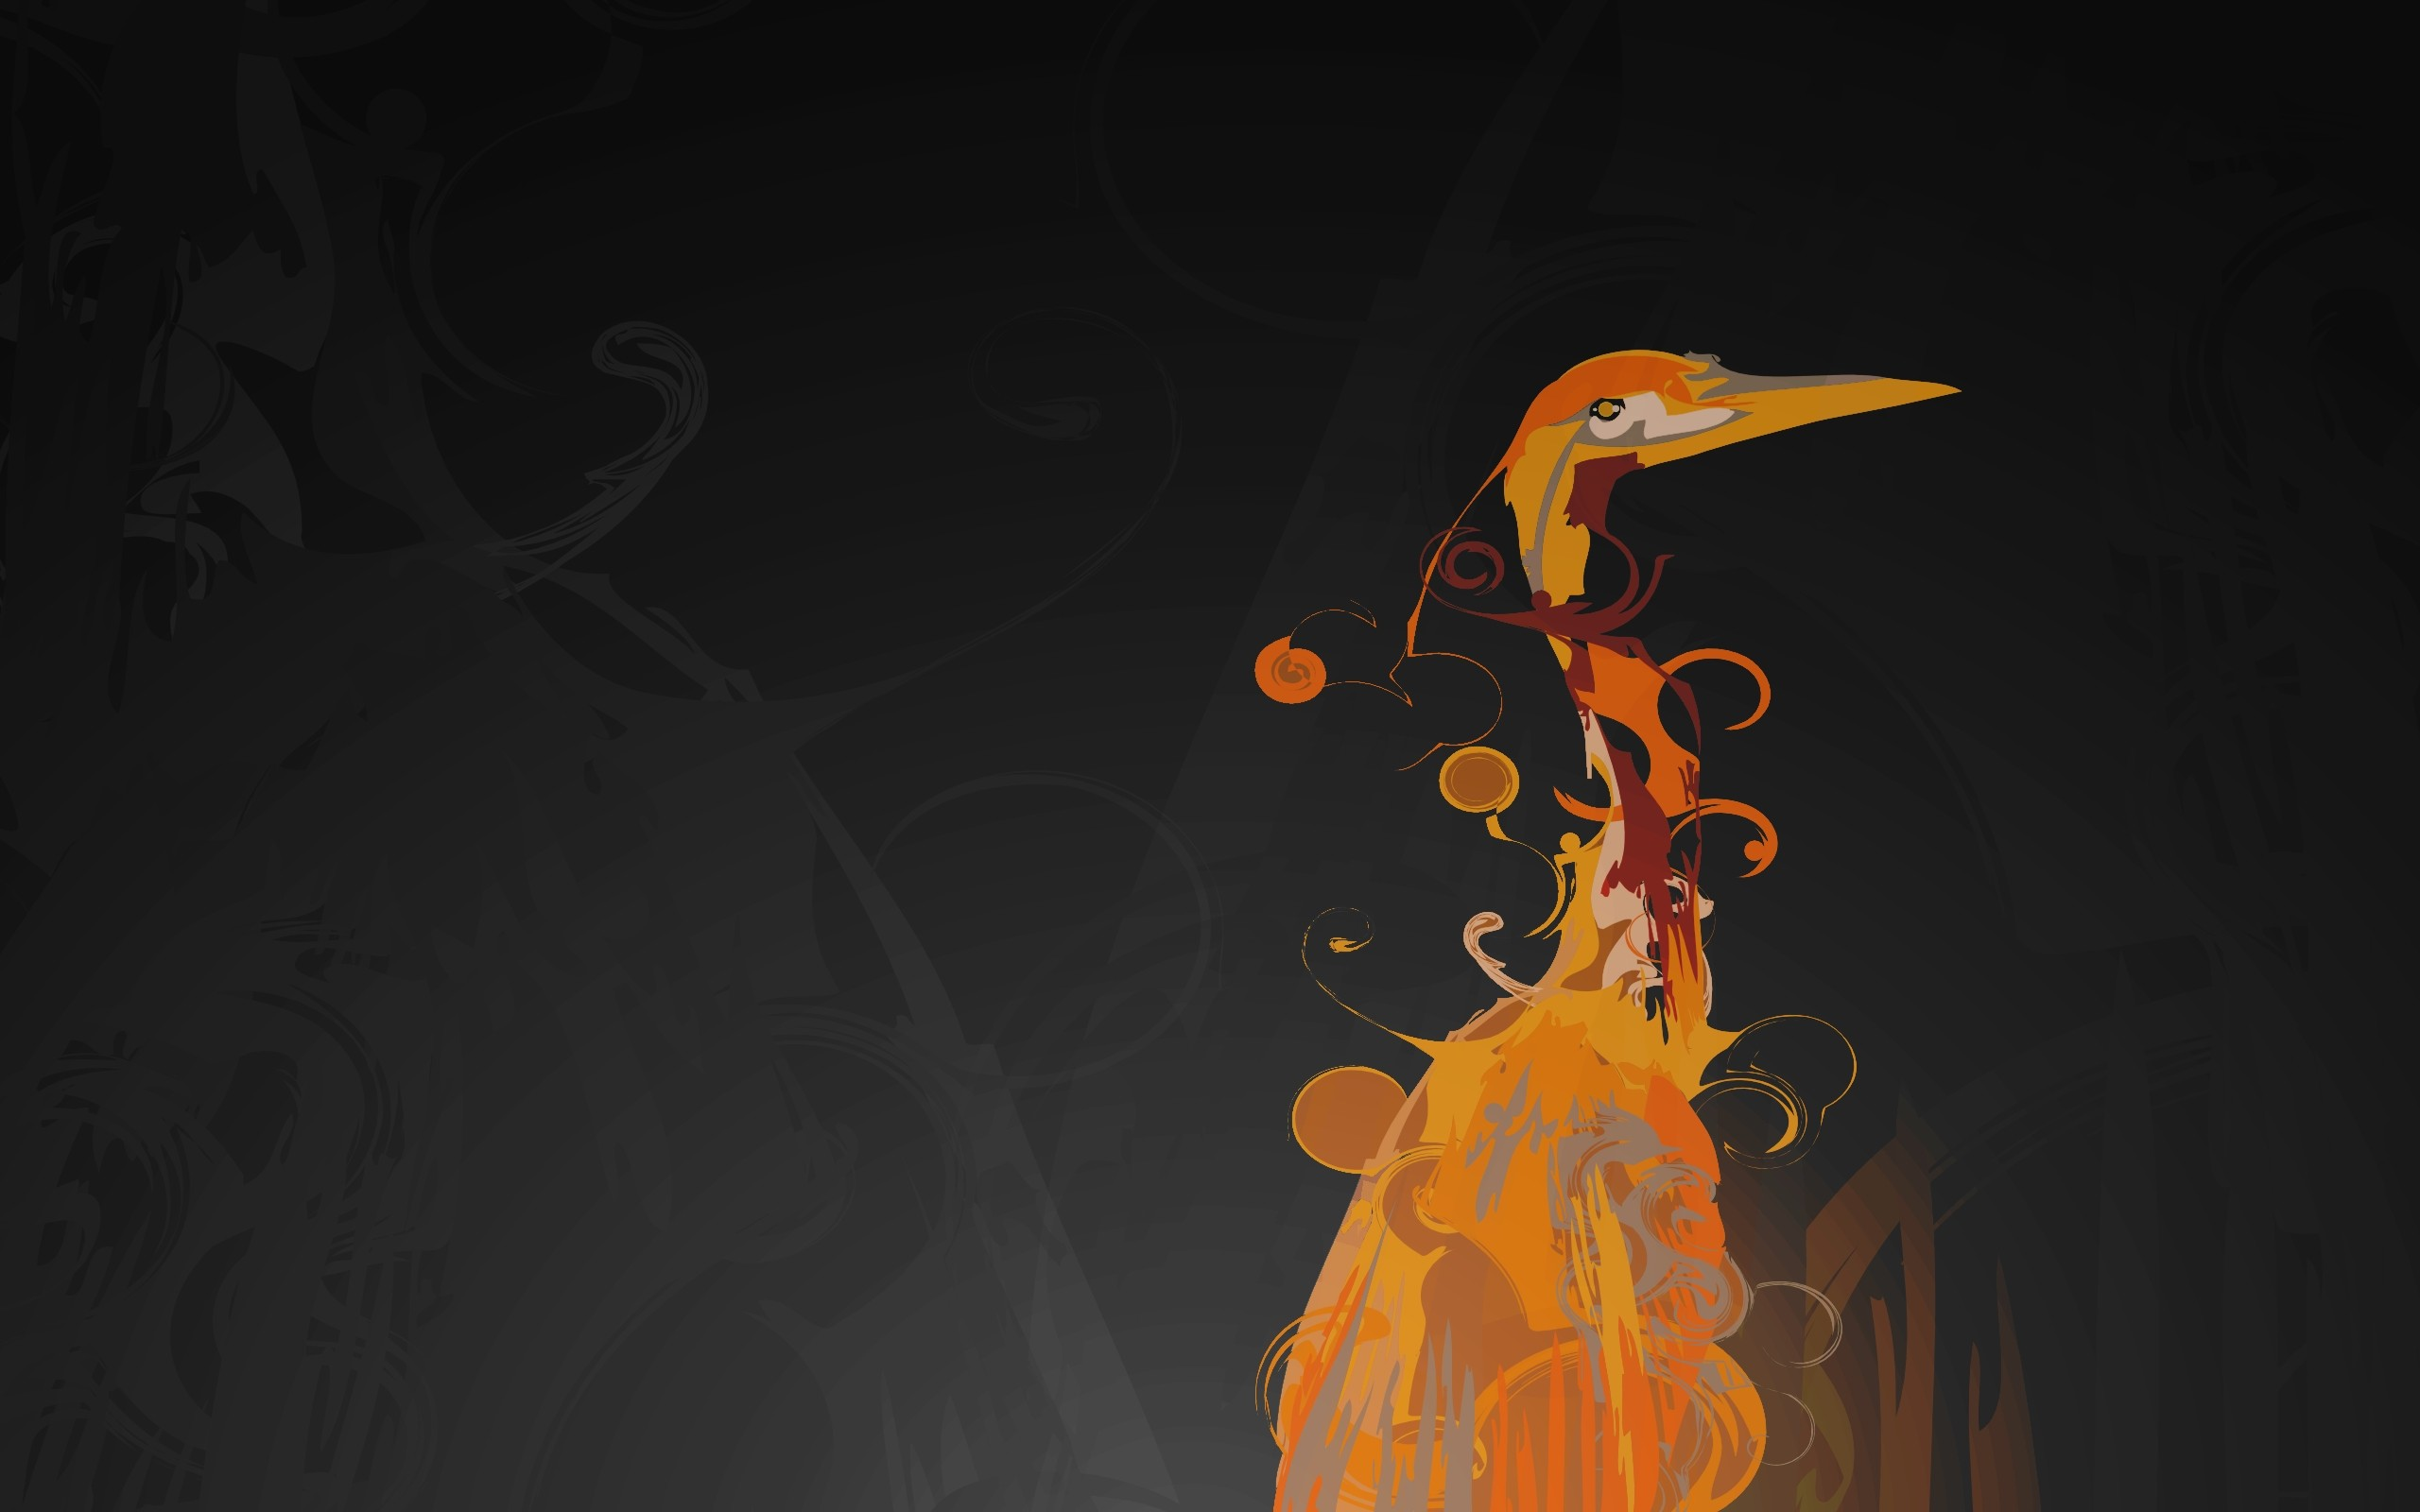 Res: 2560x1600, Heron Wallpaper 61